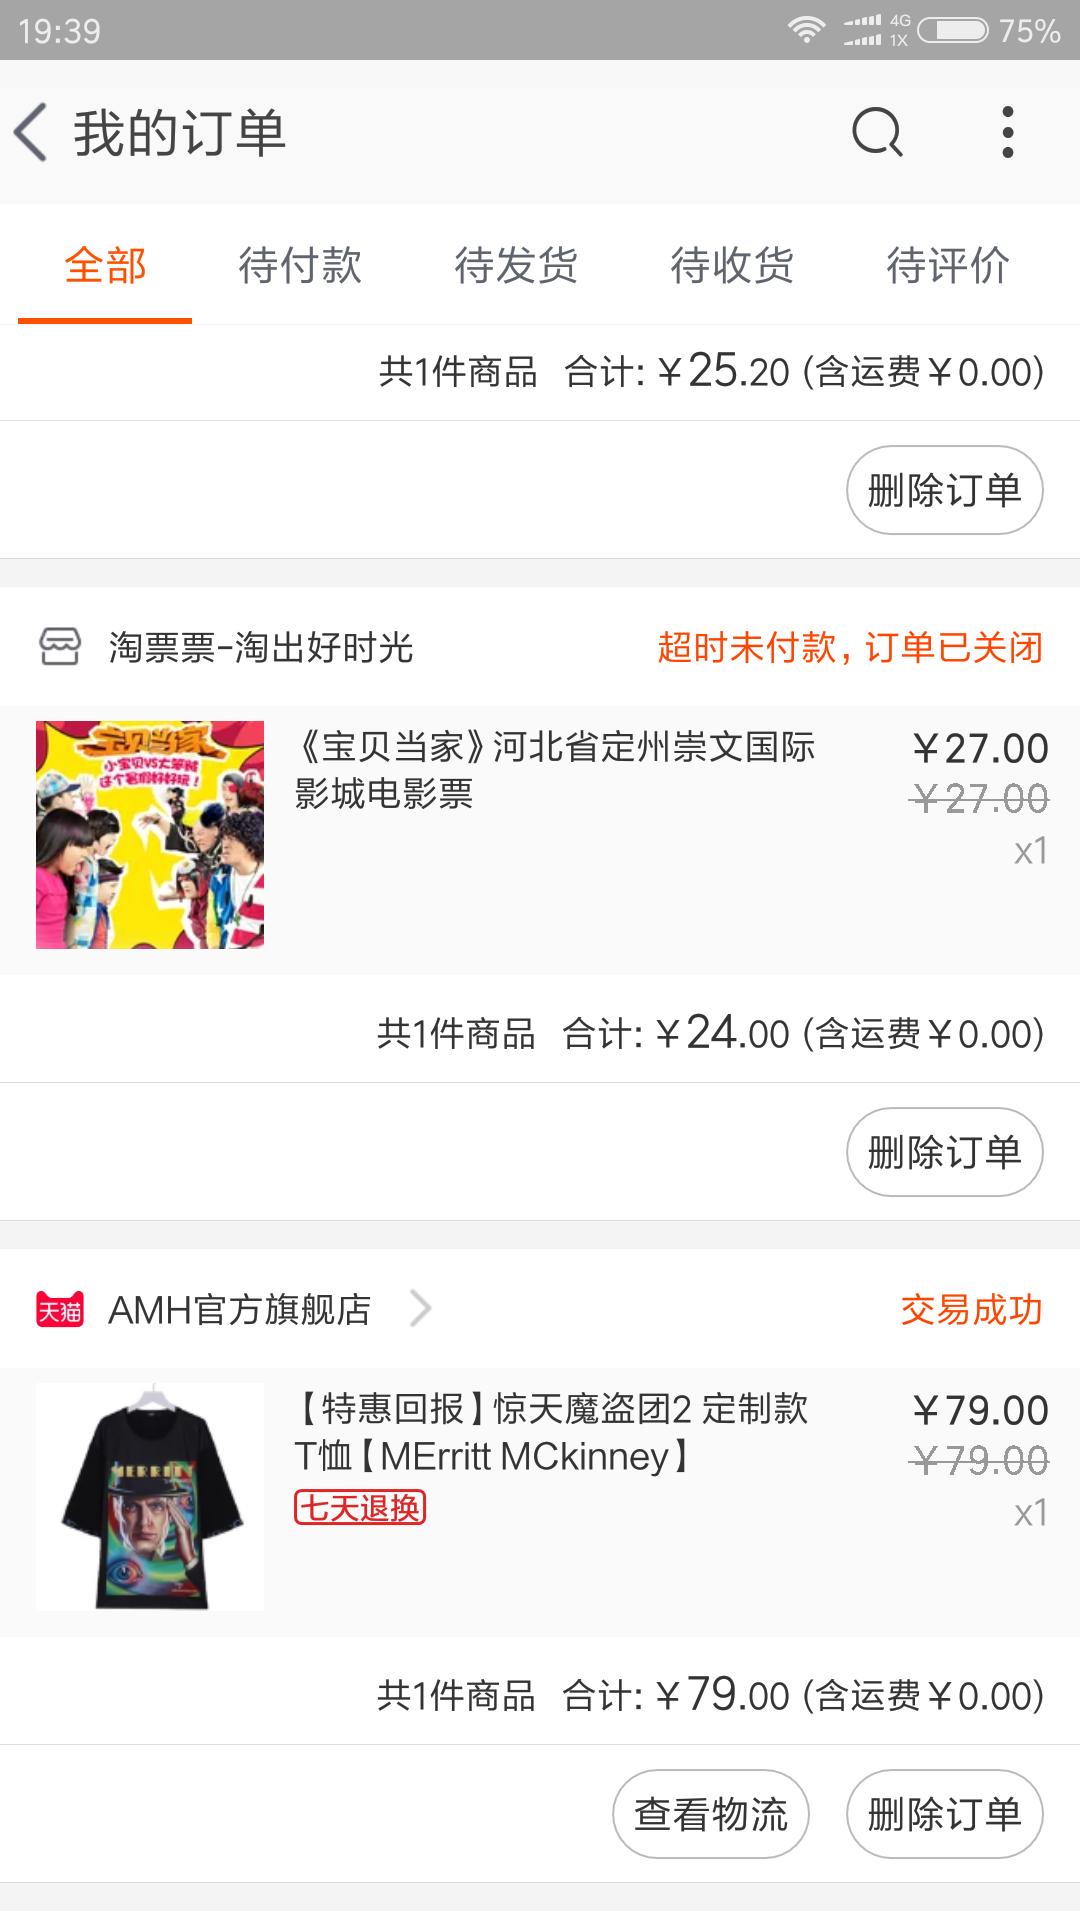 Screenshot_2017-08-22-19-39-22-643_com.taobao.taobao.png